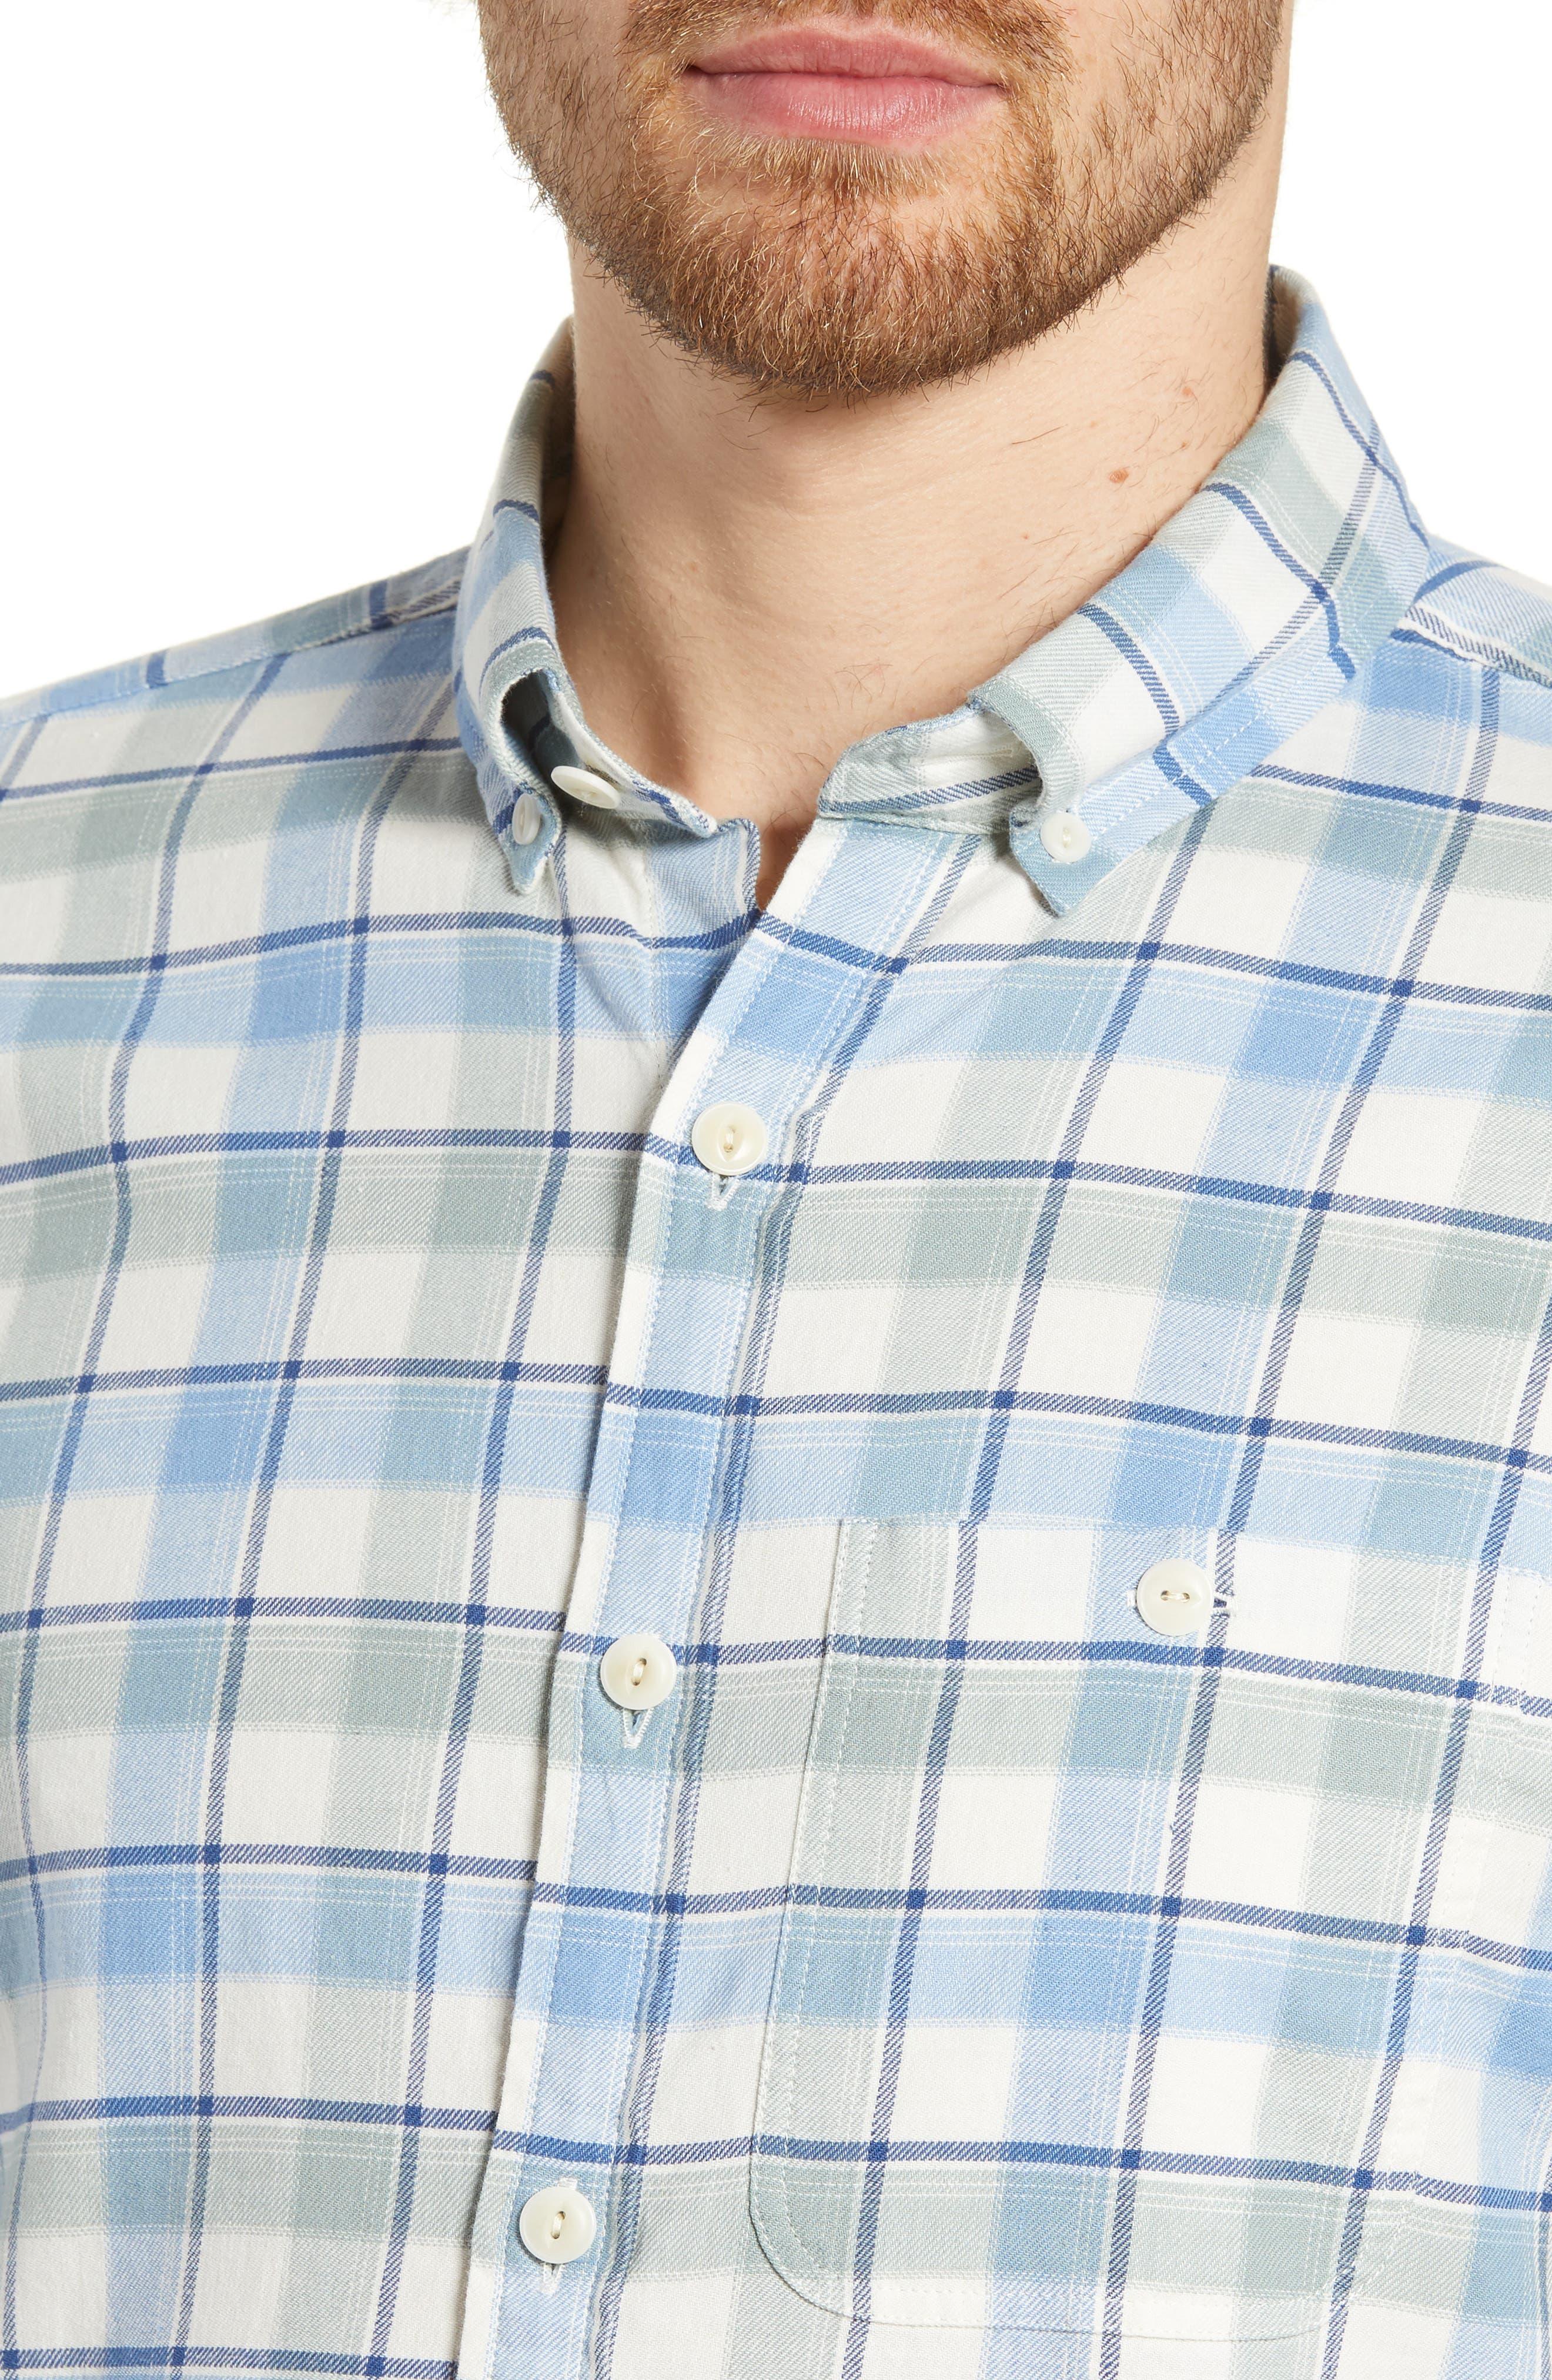 VINEYARD VINES,                             Bayside Slim Fit Plaid Sport Shirt,                             Alternate thumbnail 2, color,                             LIGHT SAGE